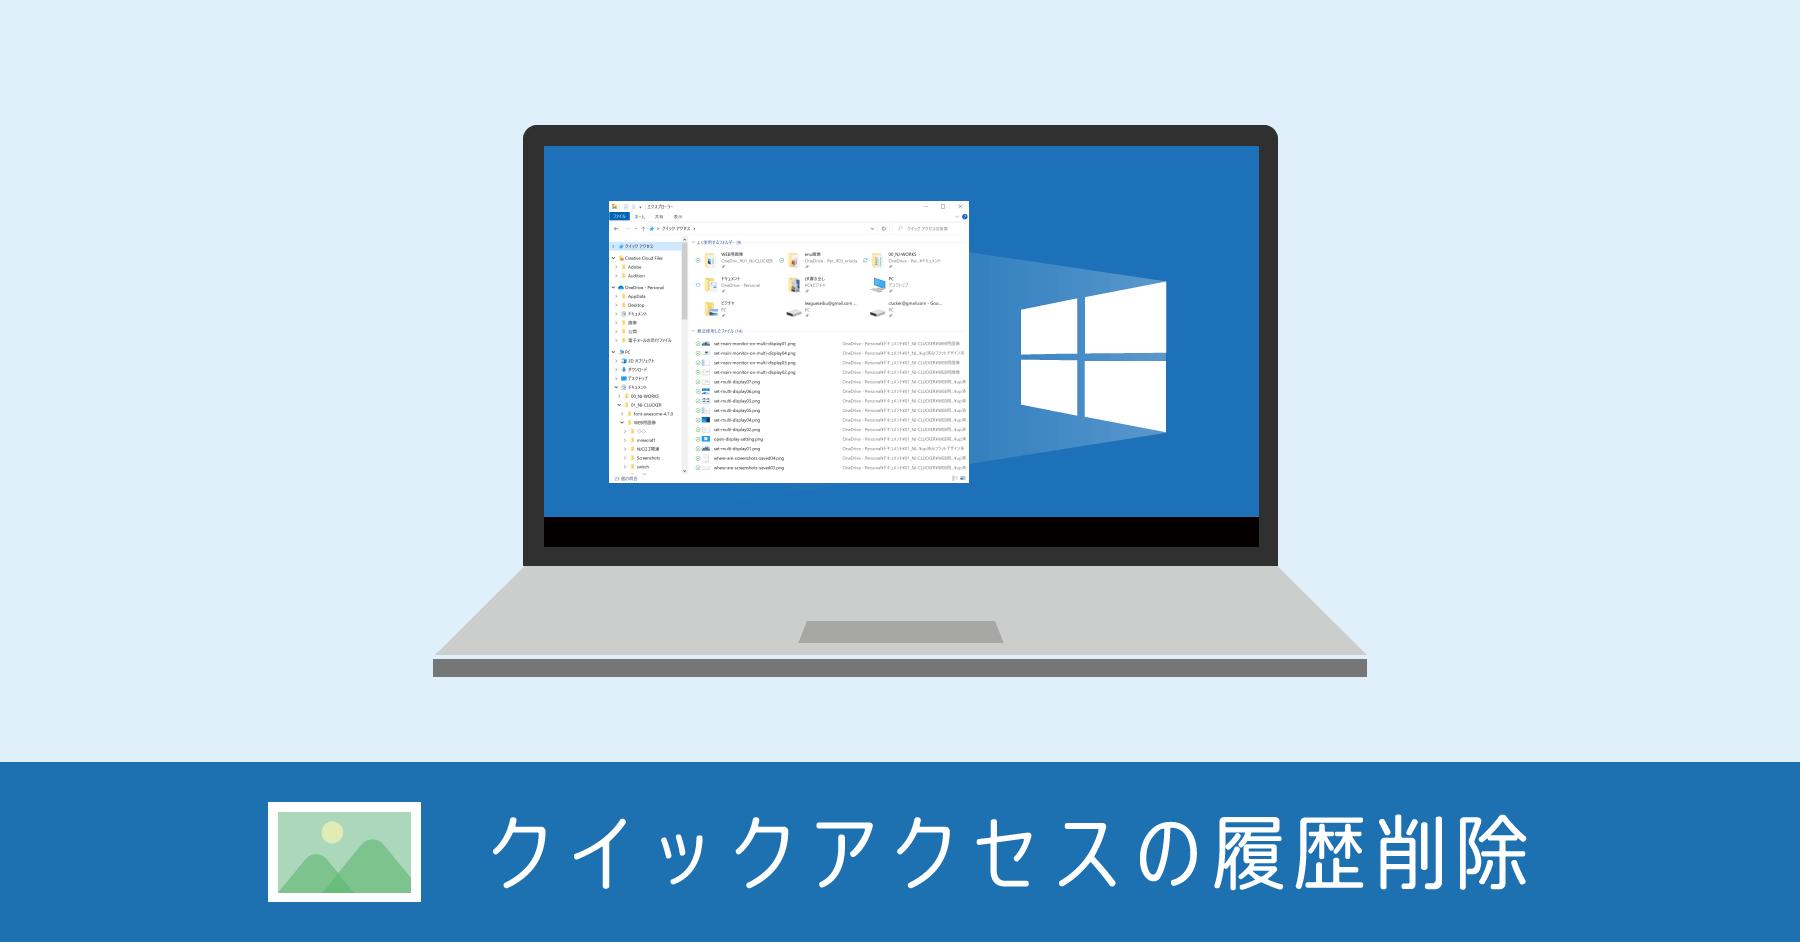 Windows 10 クイックアクセス履歴削除